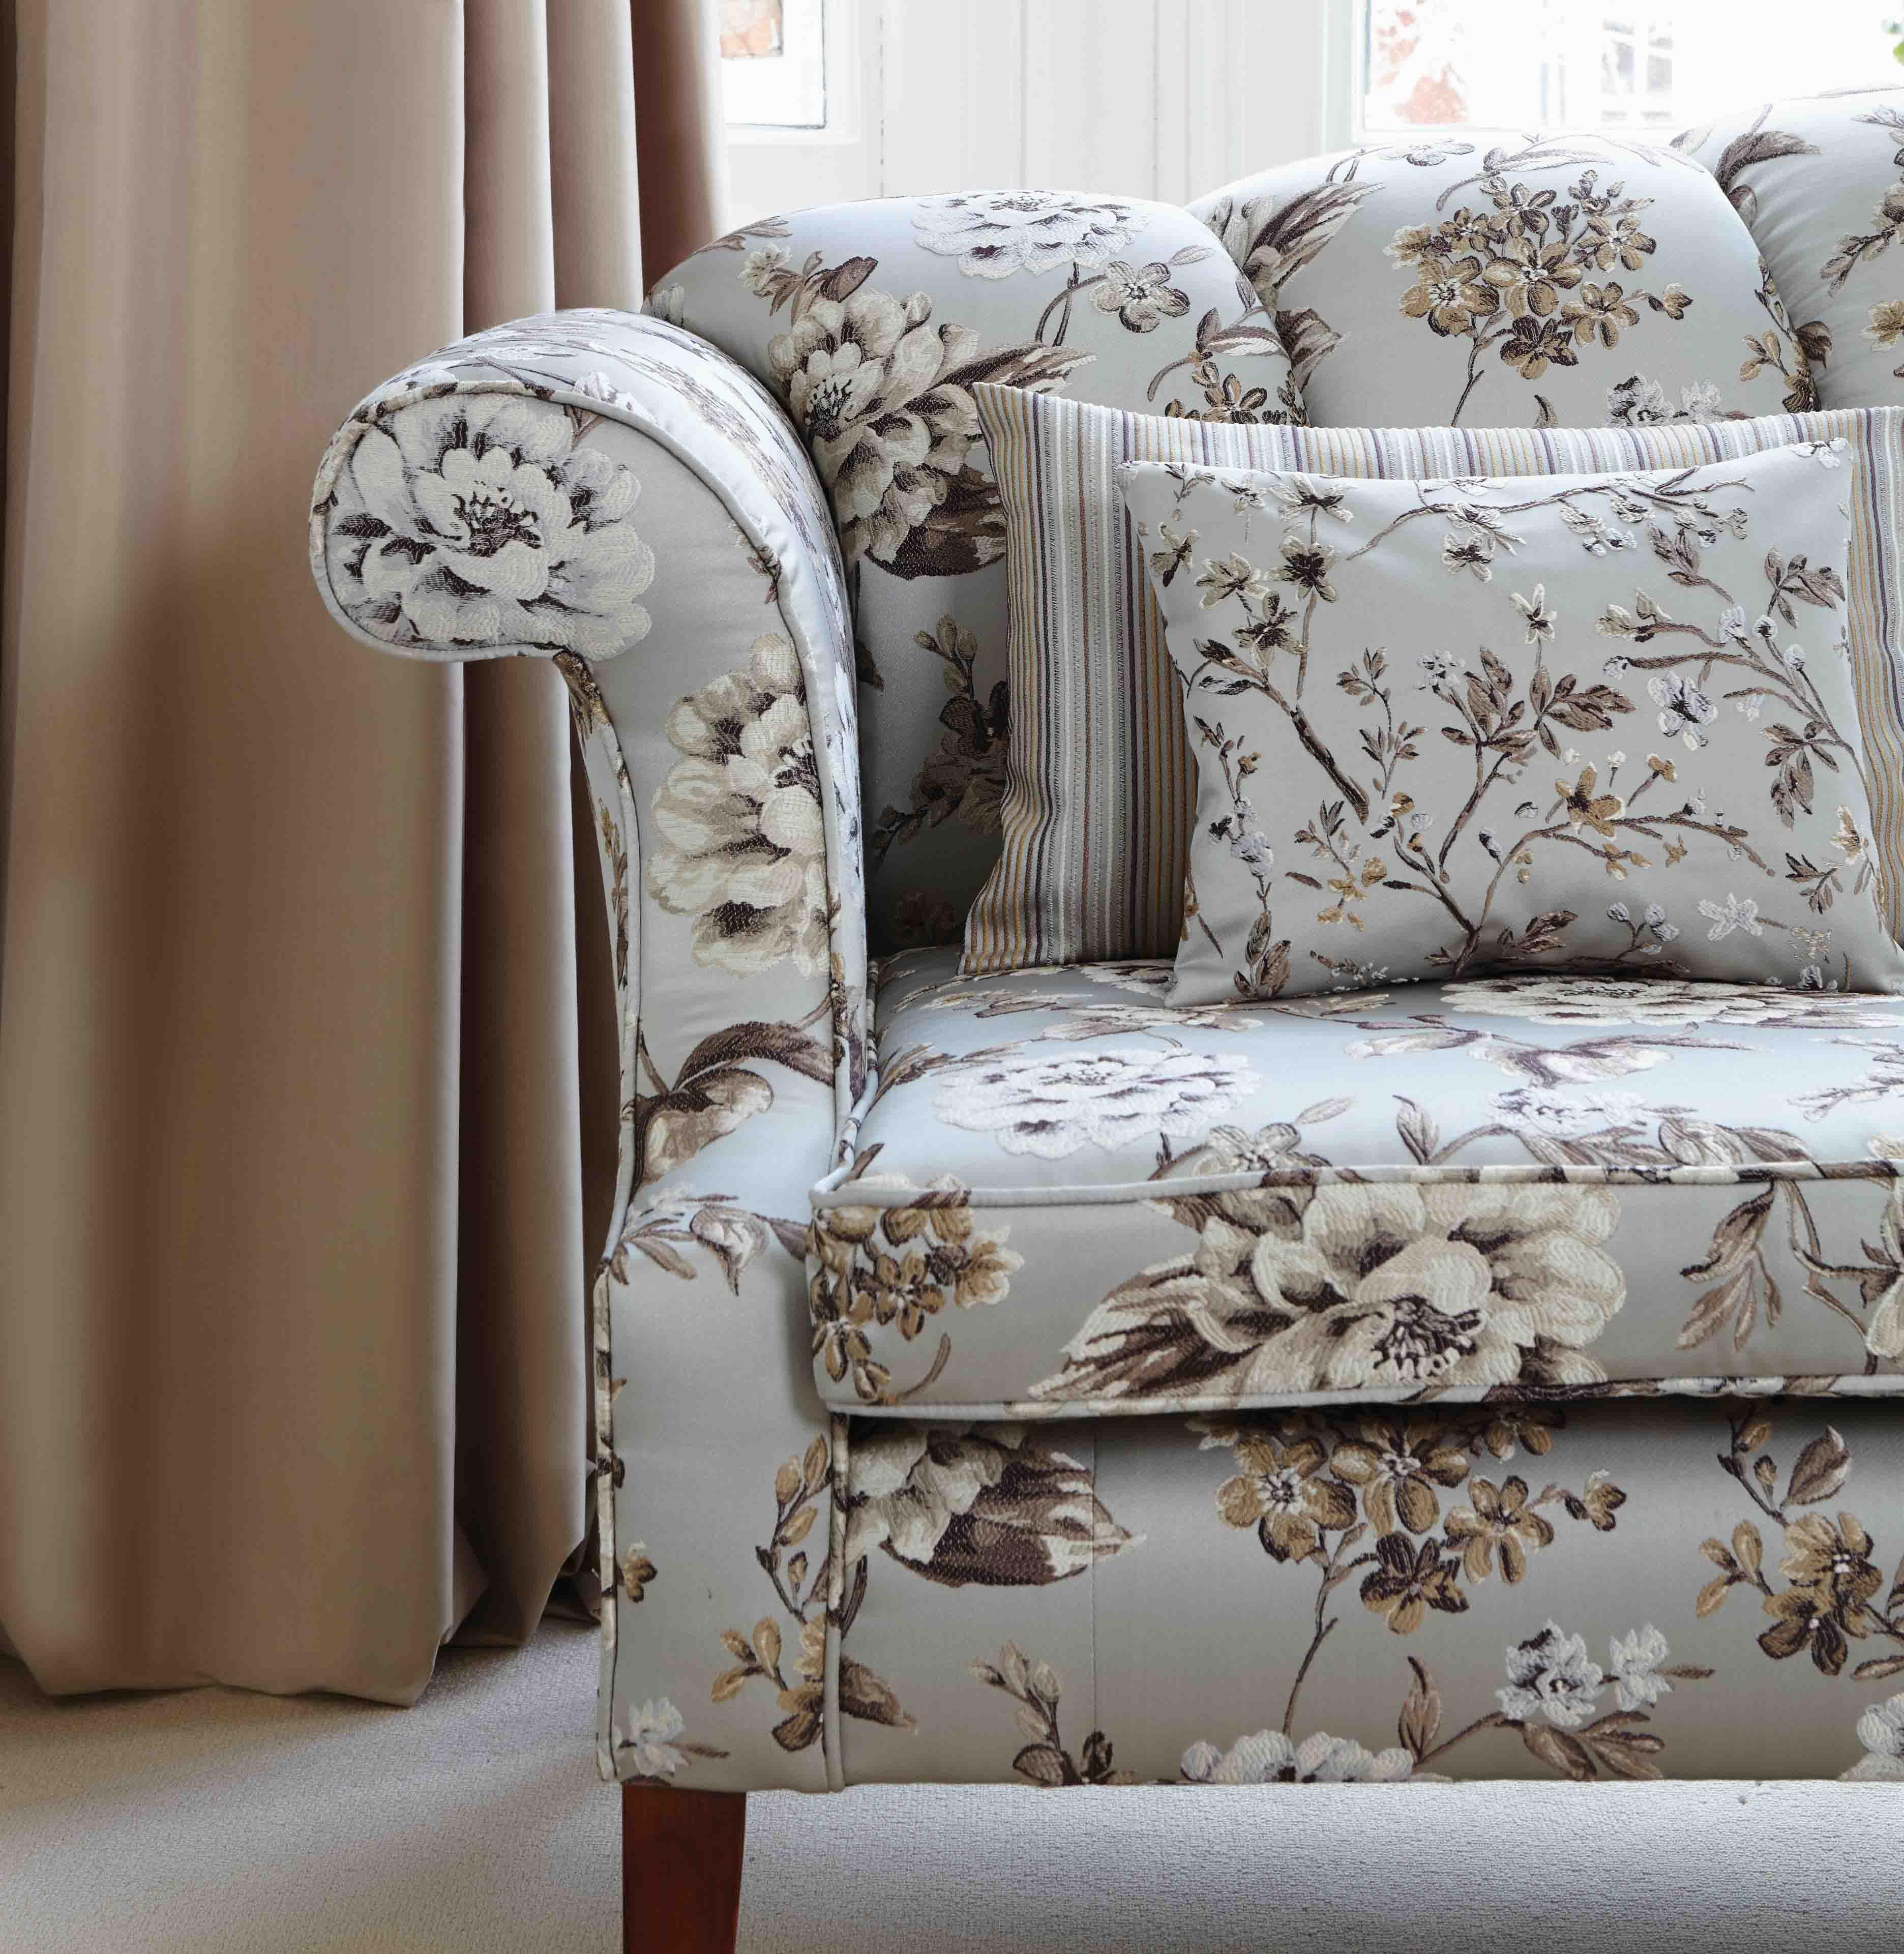 Themildencollection Designinpsiration Ddecor Couch Fabric Design Art Cushion Homedecor Design Interior Furniture Furniture Decor Decor